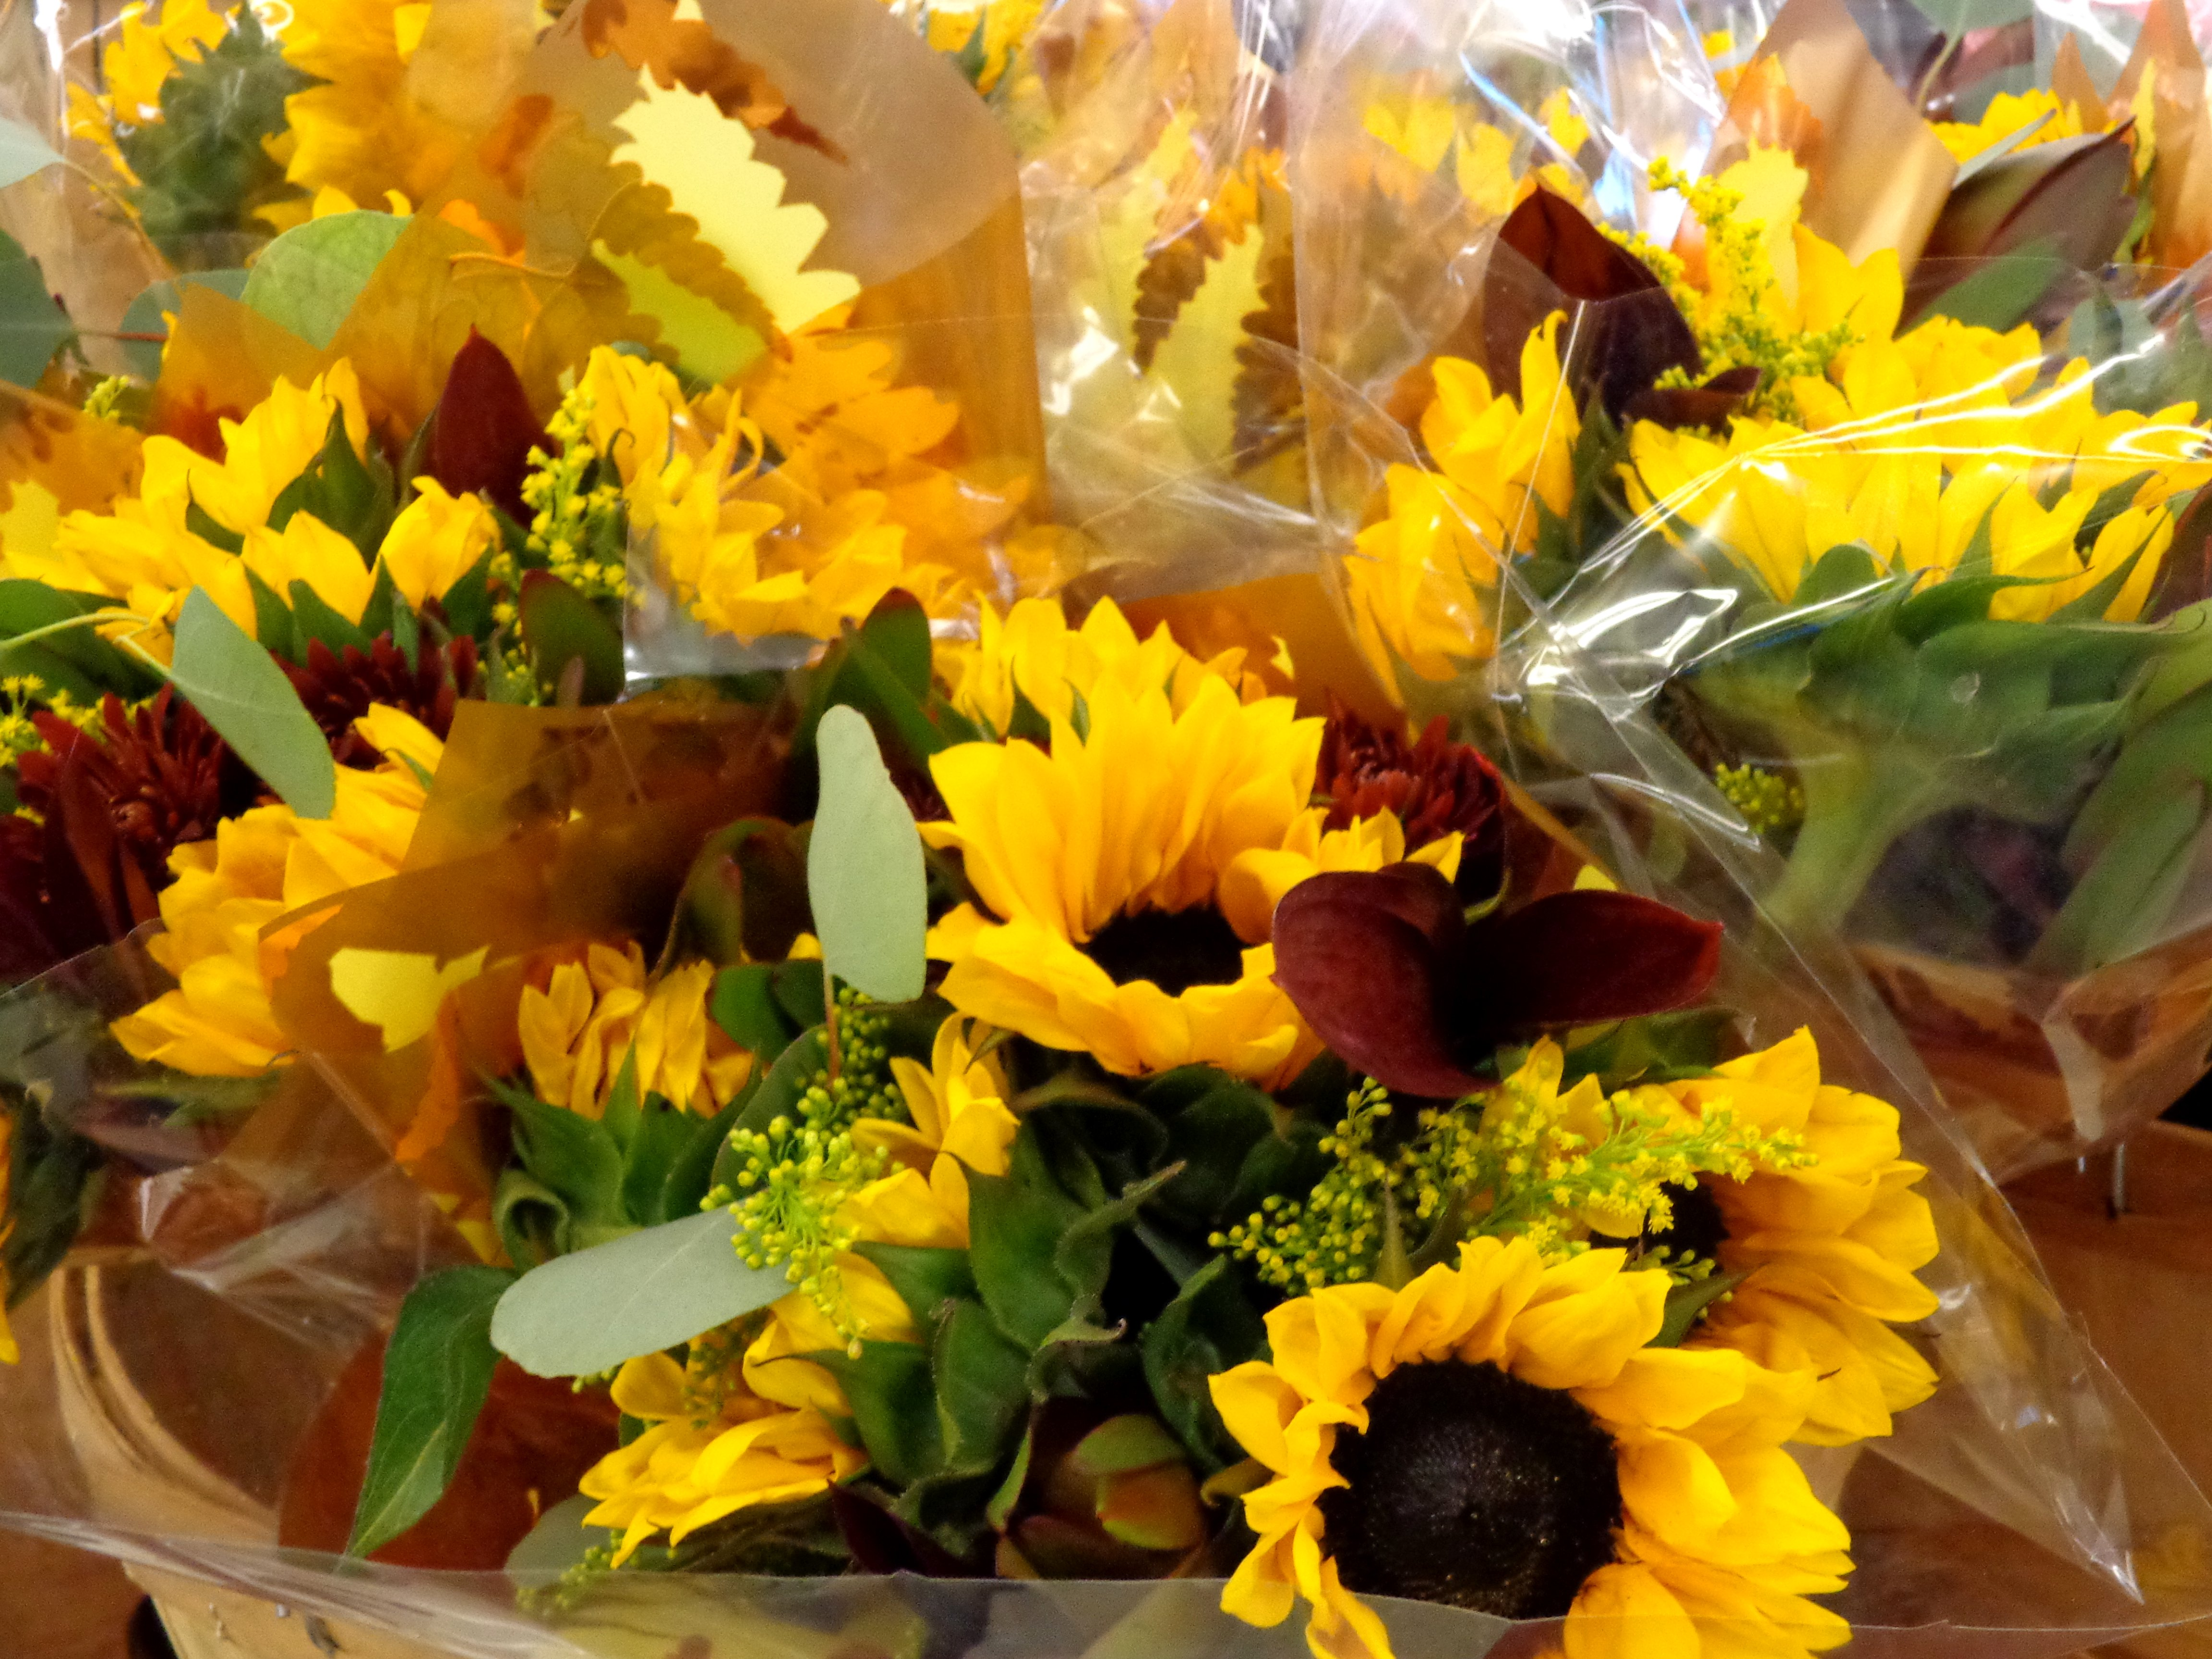 Autumn Flower Bouquets   High Resolution Photo   Dimensions 4608 4608x3456